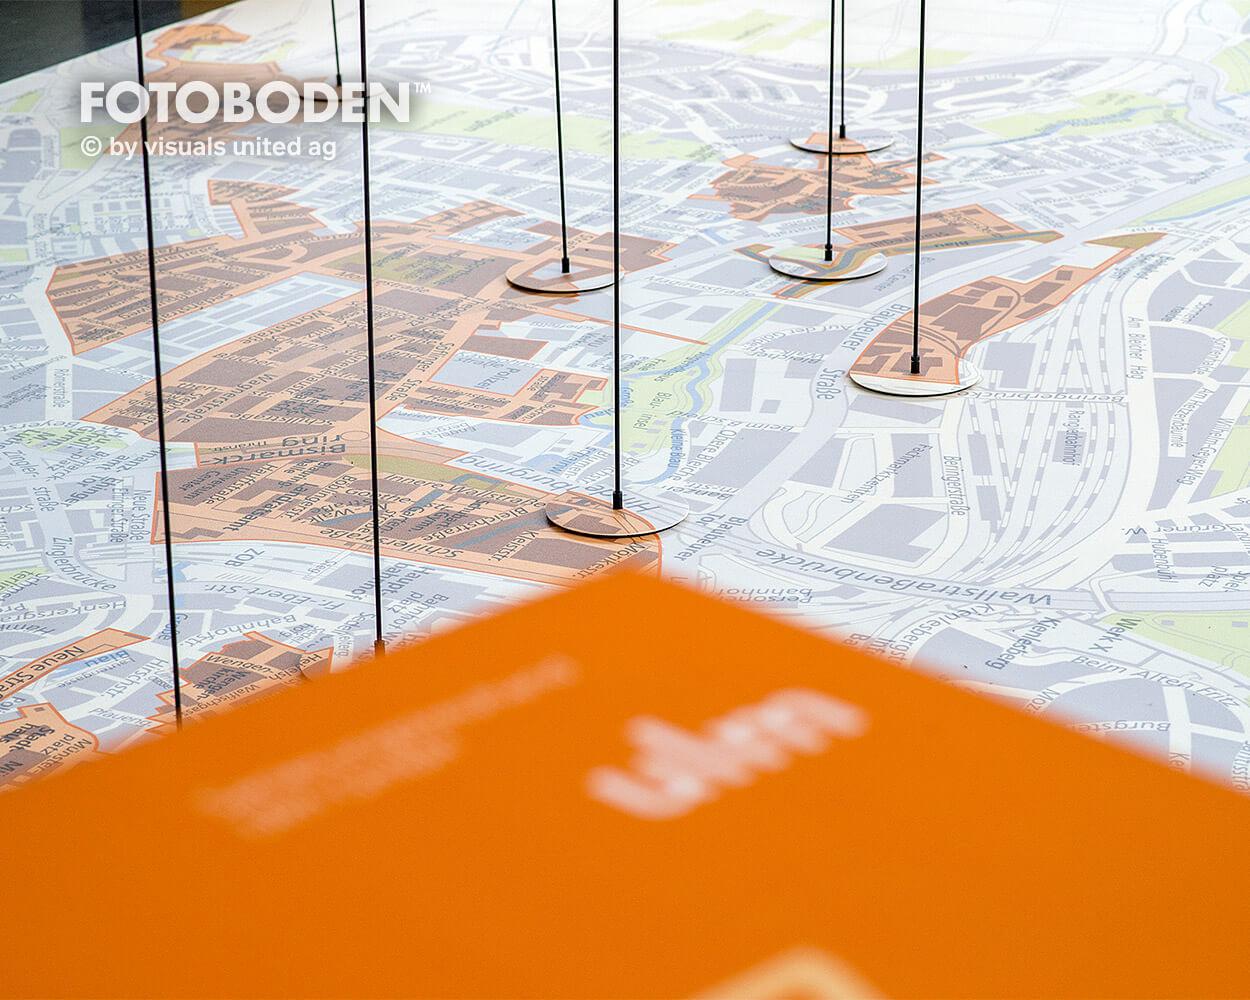 Sparkasse Ulm Ausstellung Museum  Raumkonzept Stimmung Museumsboden Ausstellungsboden Fotoboden Vinylboden Flooring Individuell Event2